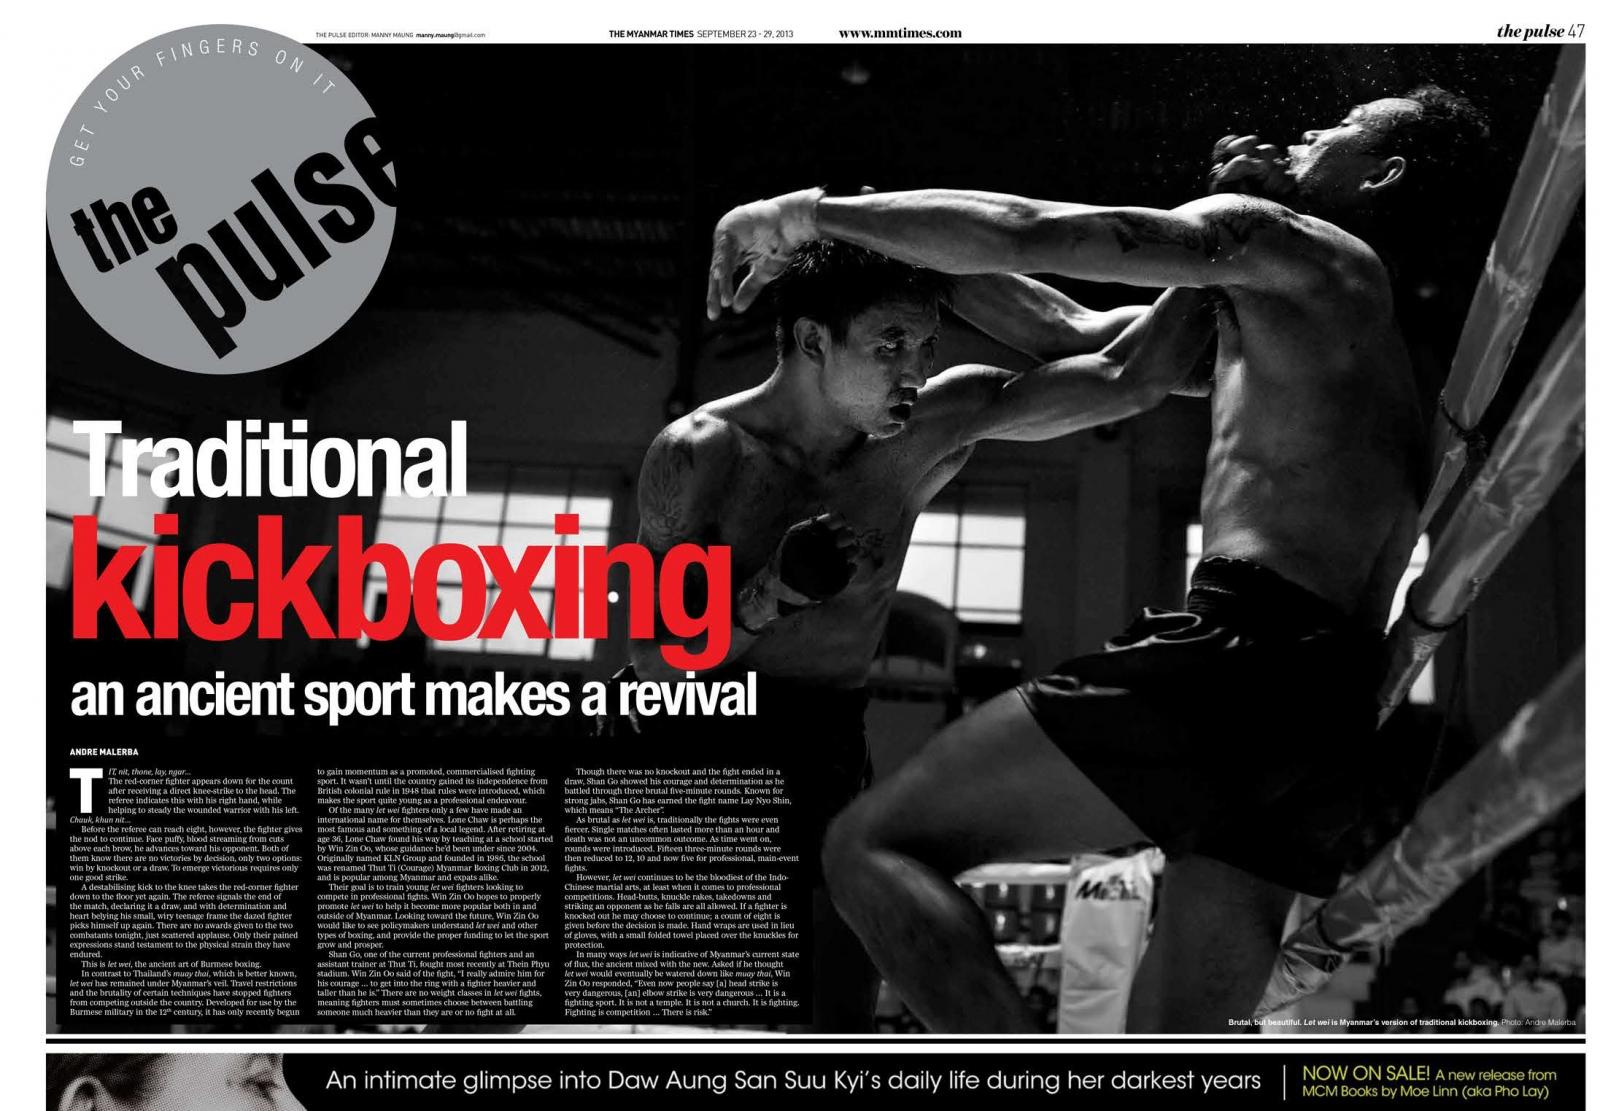 Myanmar Times, September 2013.